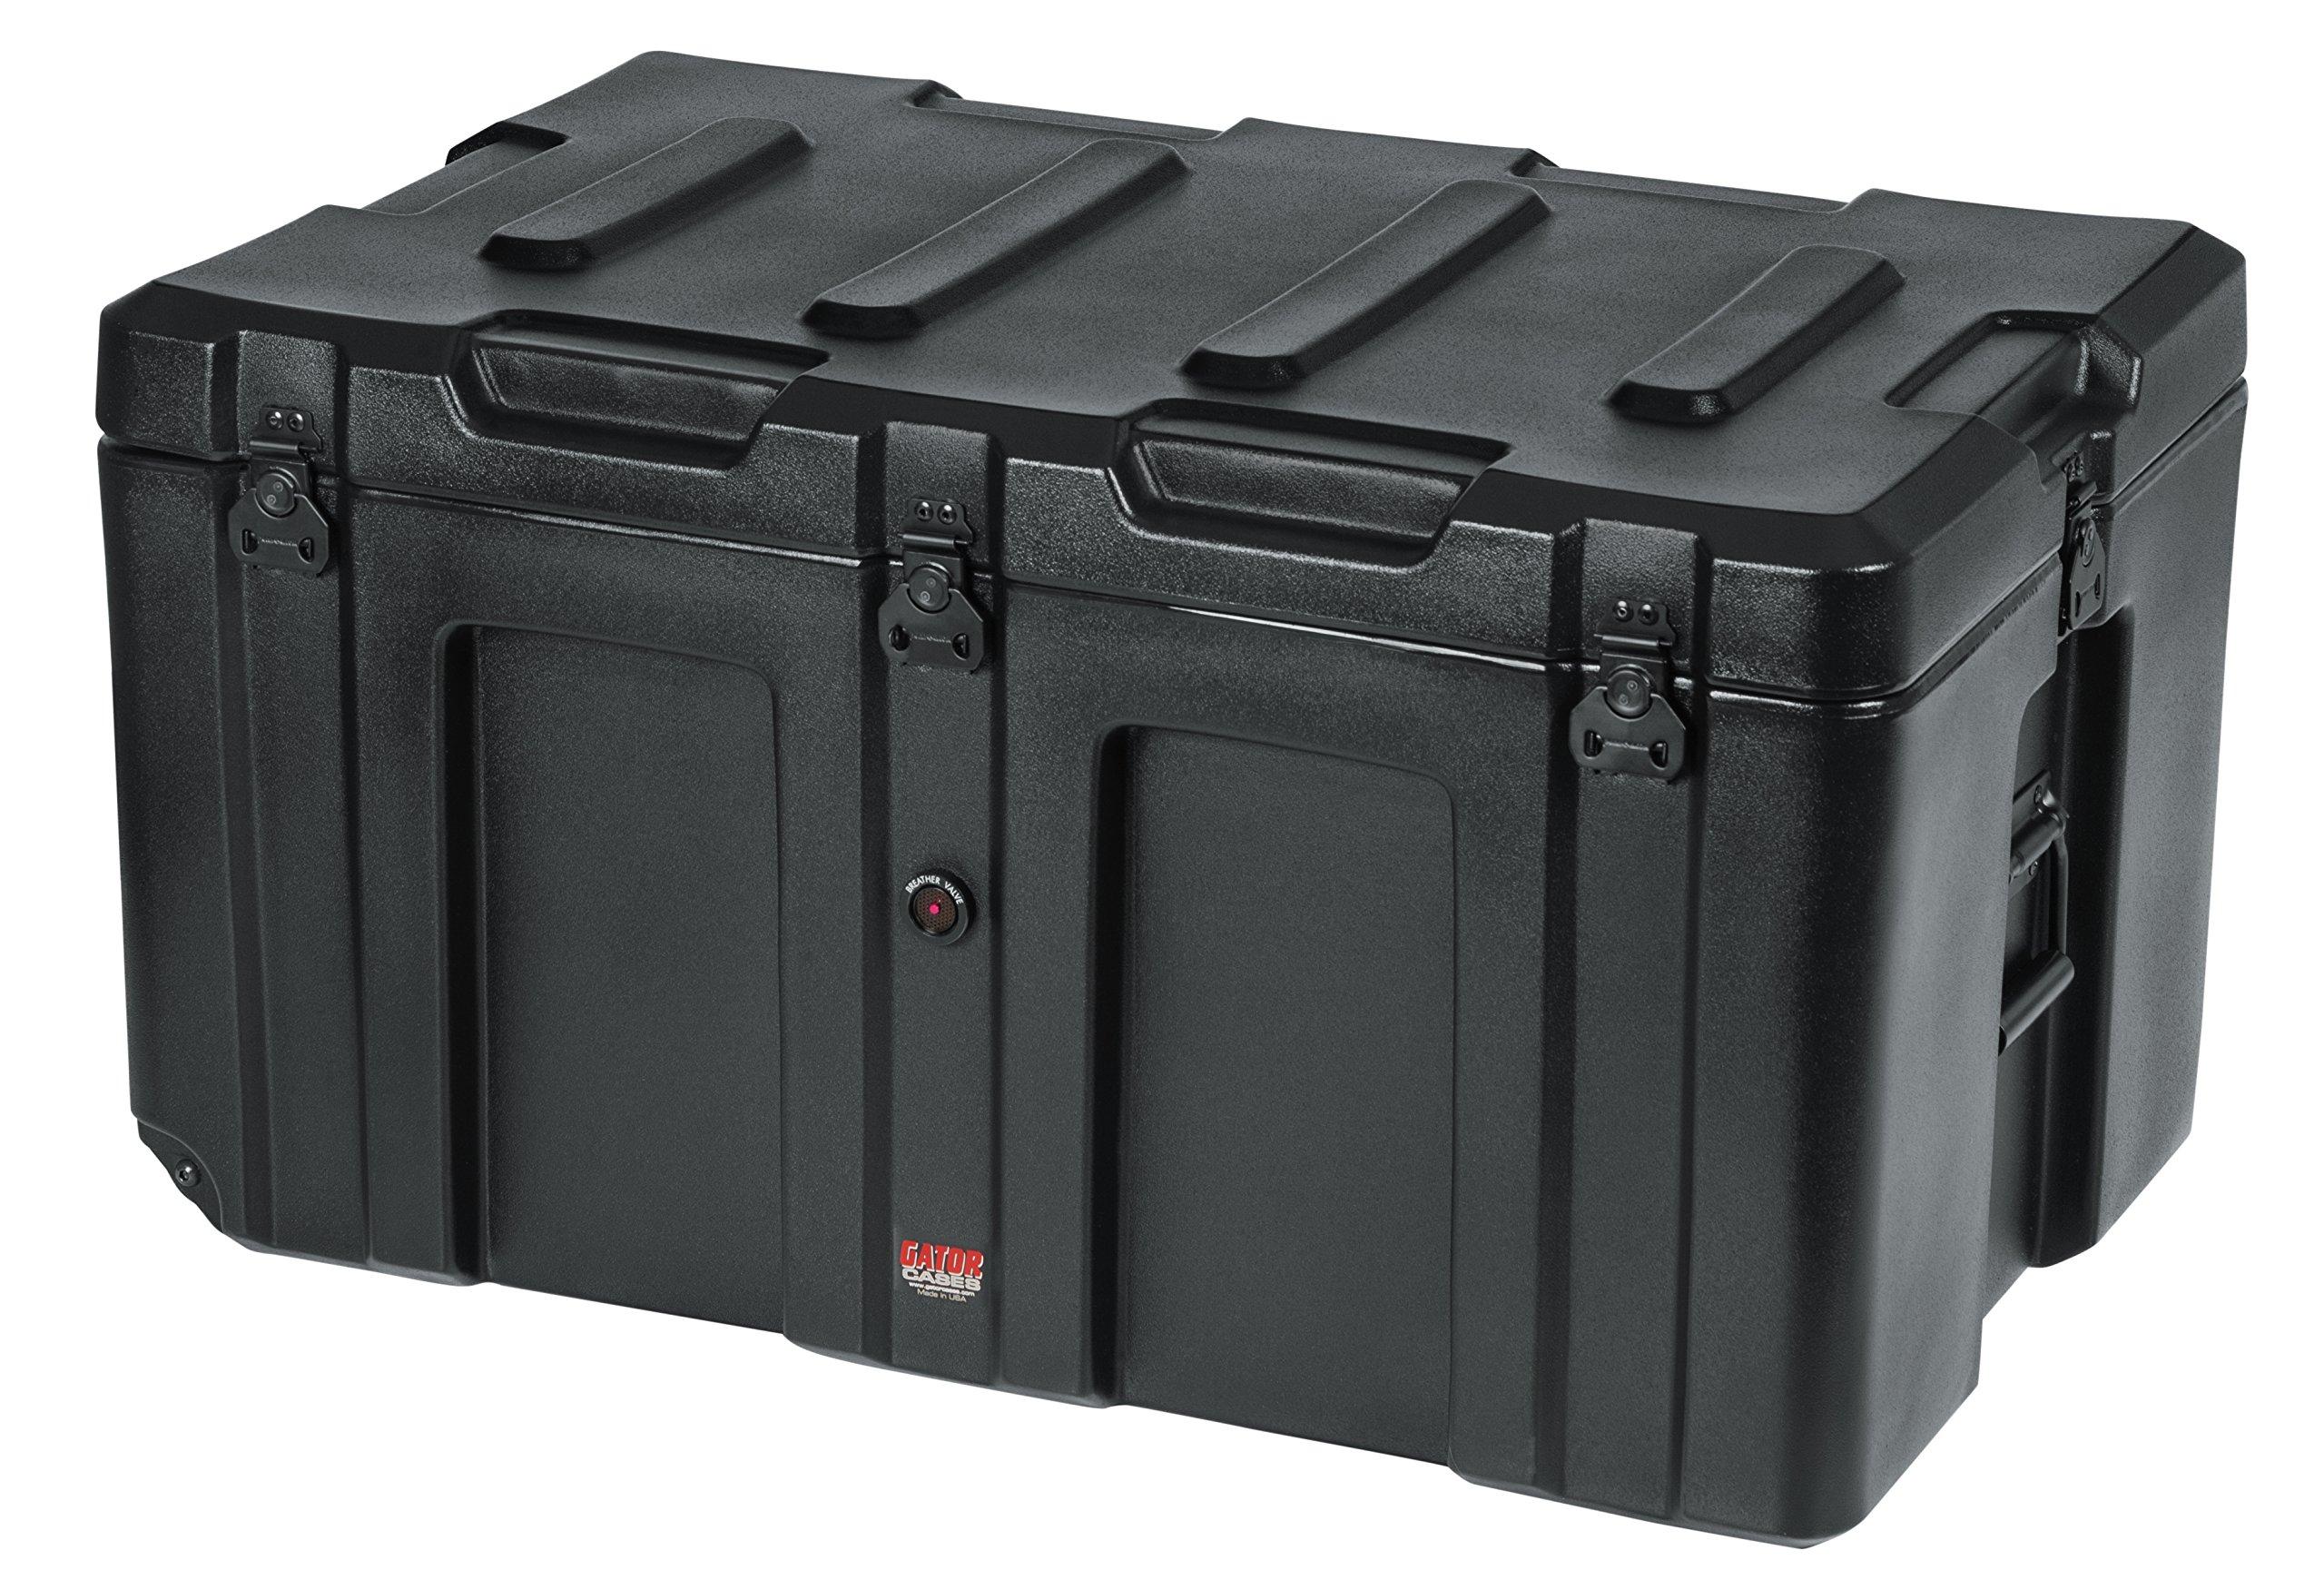 Gator Cases GXR-2819-0803 ATA 旋转模制多功能外壳,28 英寸 x 19 英寸 x 11 英寸 内部GXR-3219-1603 32